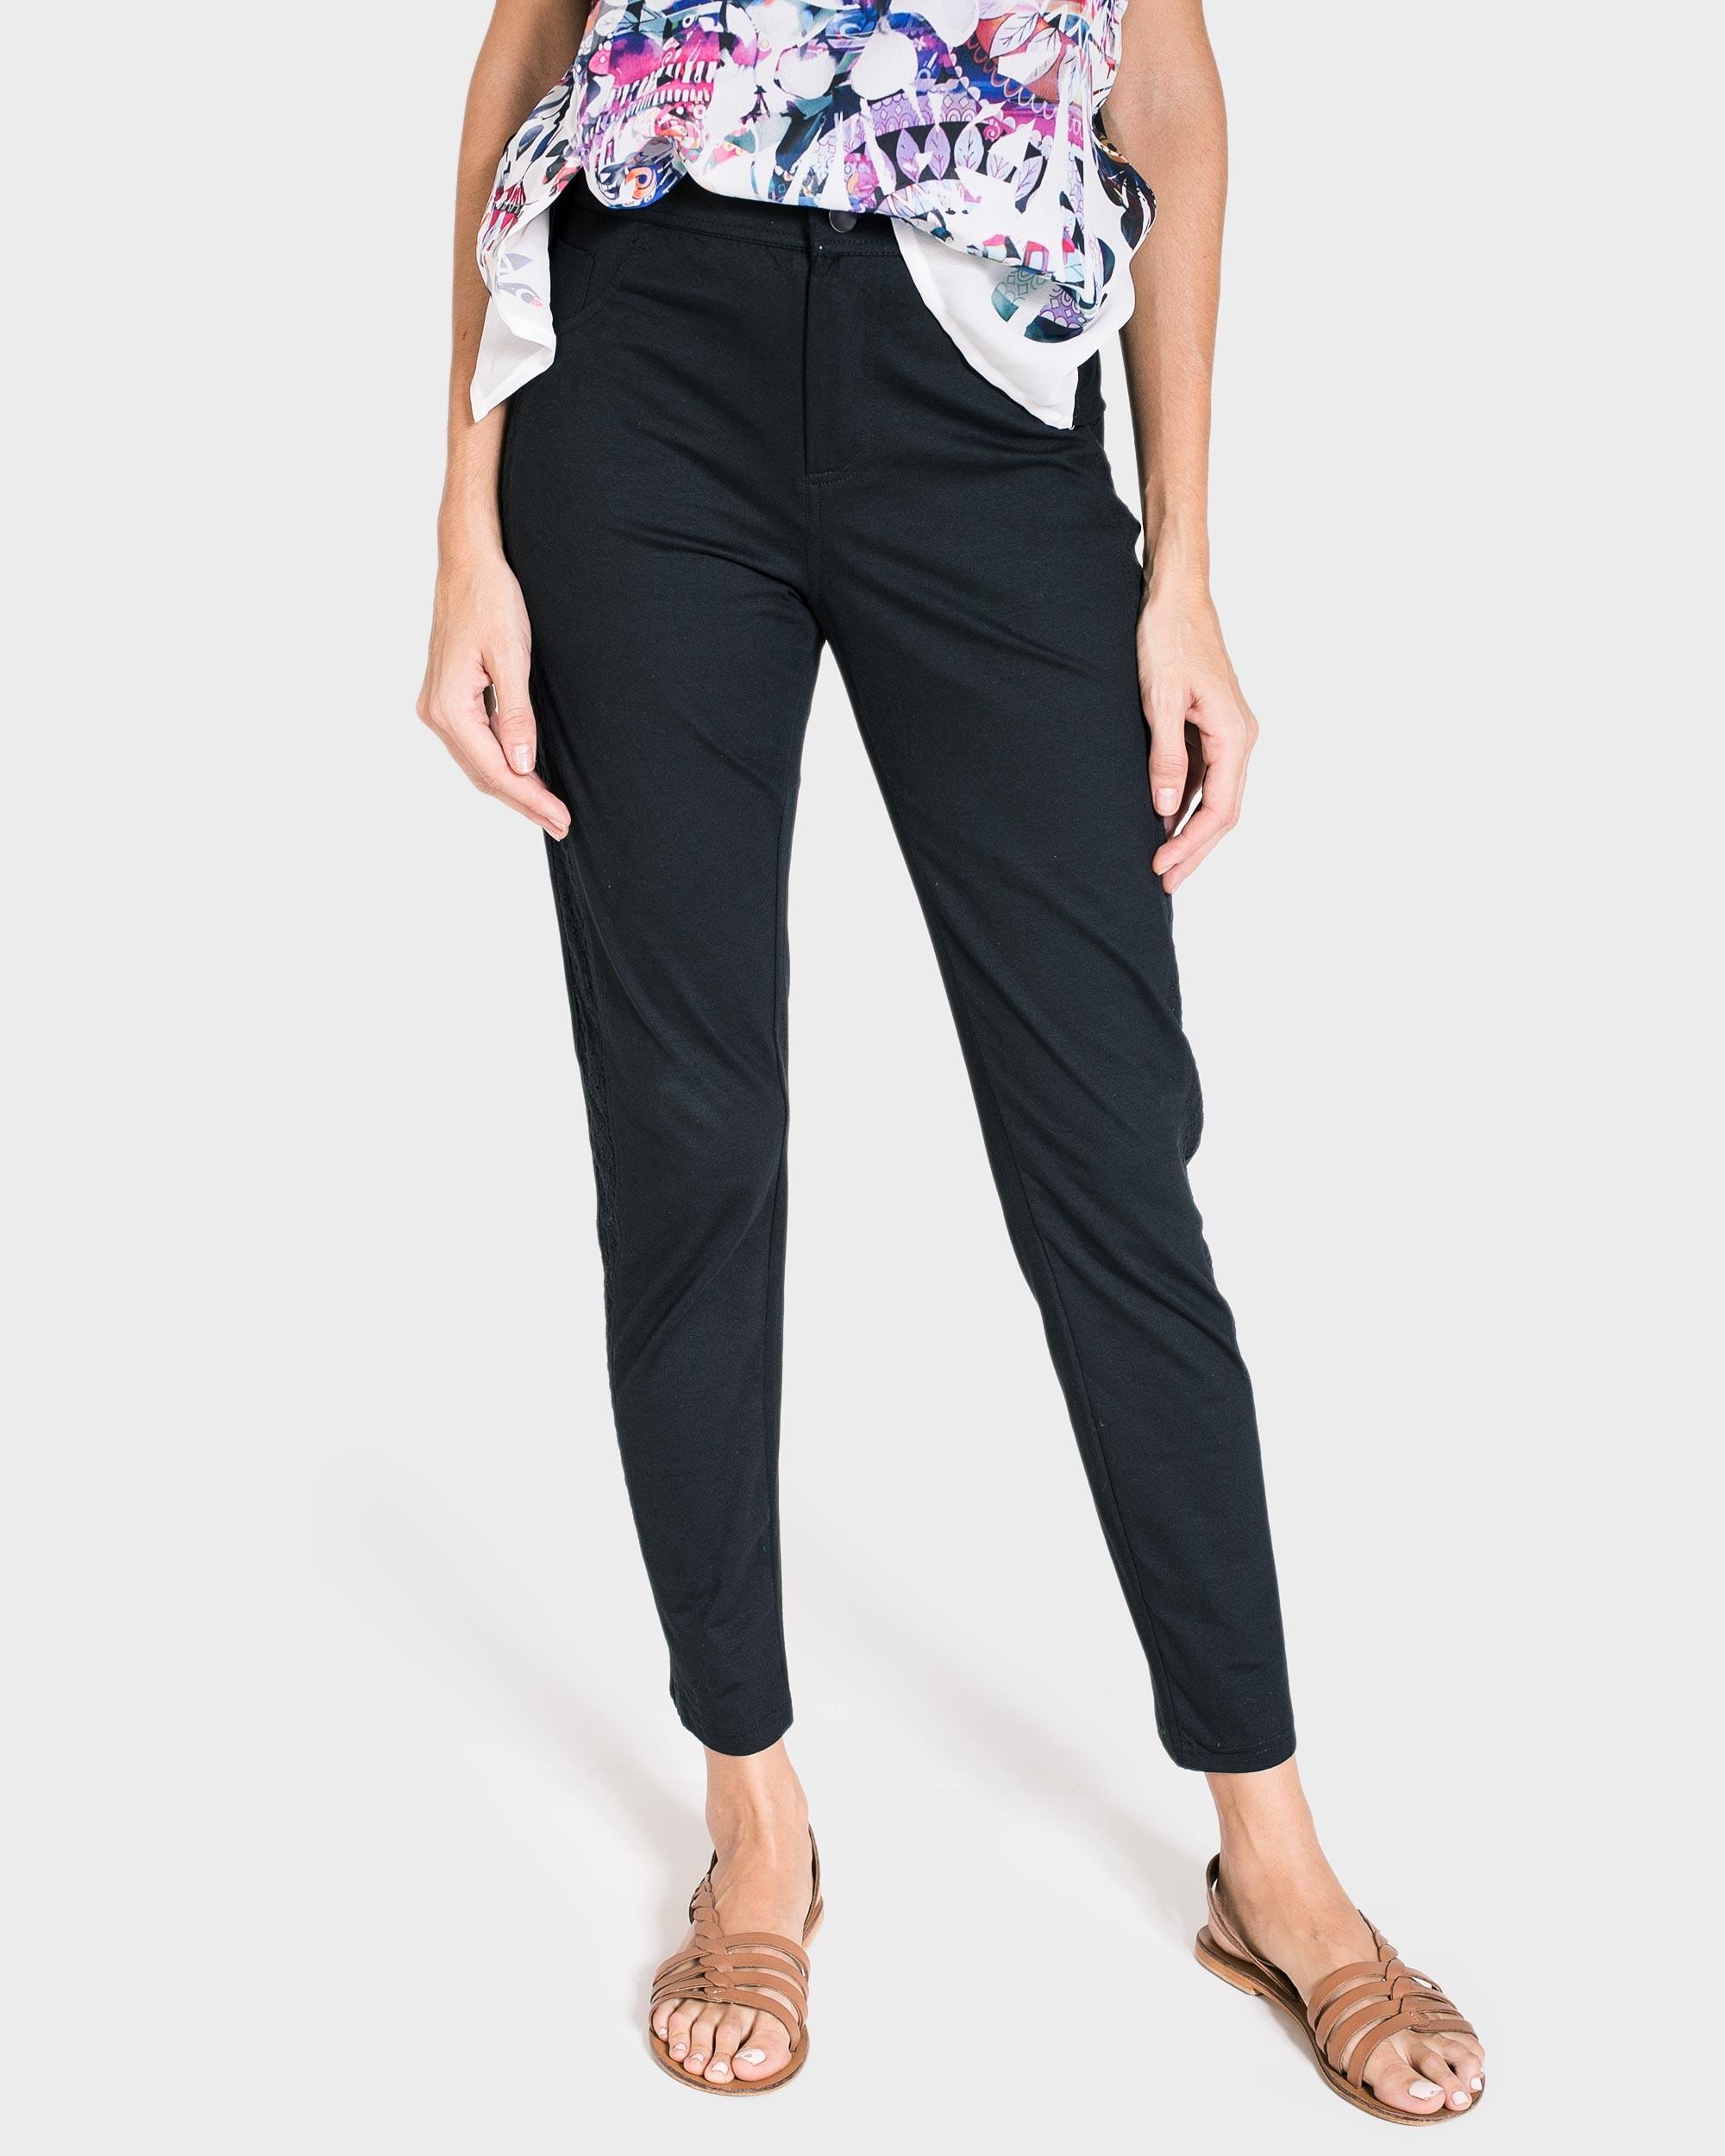 Pantalon Mujer Negro Verano Centro Textil Massana S L